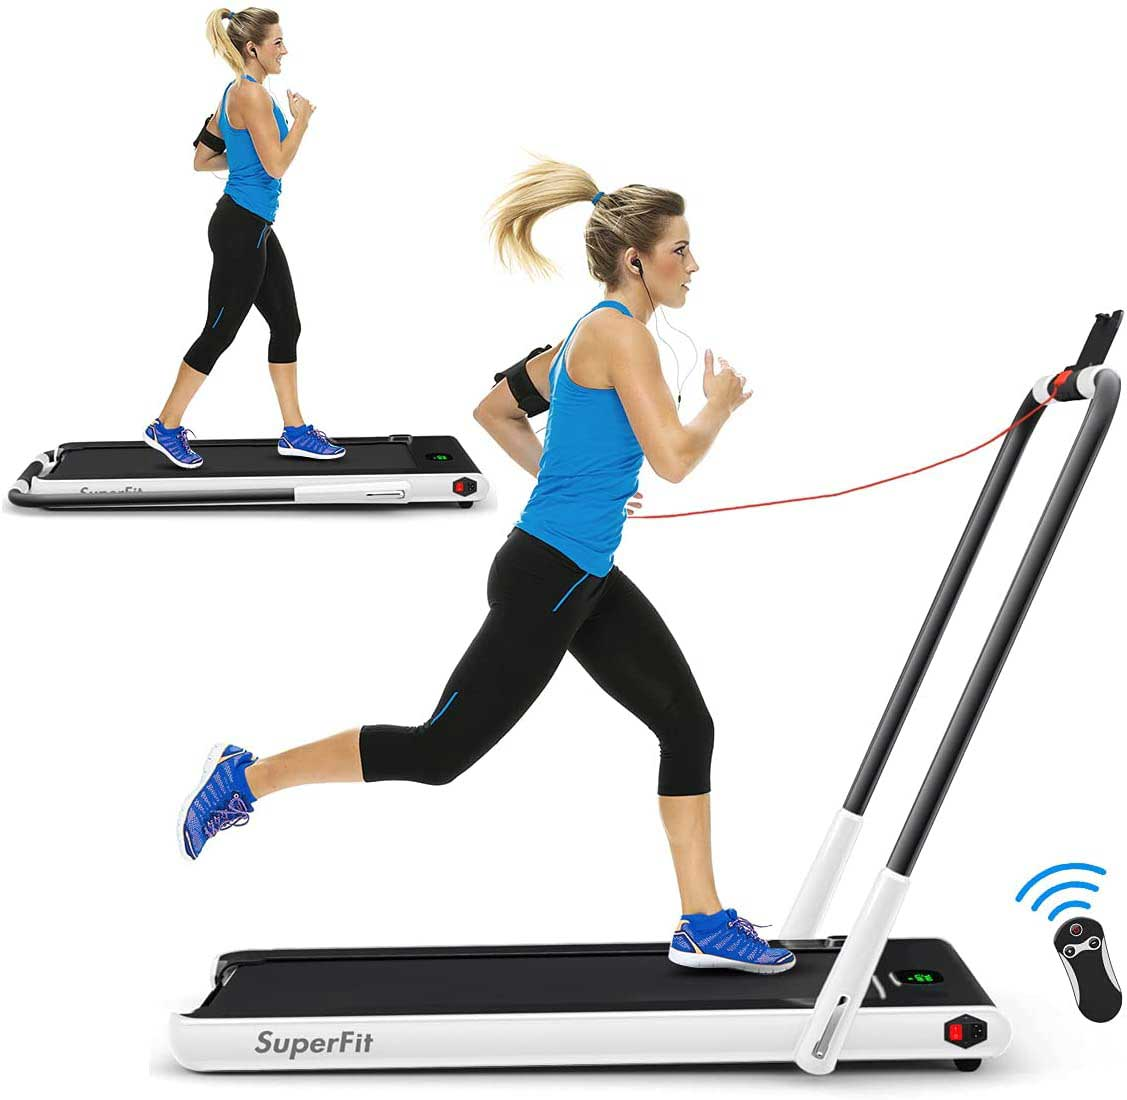 5.-Goplus-2-in-1-Folding-Treadmill